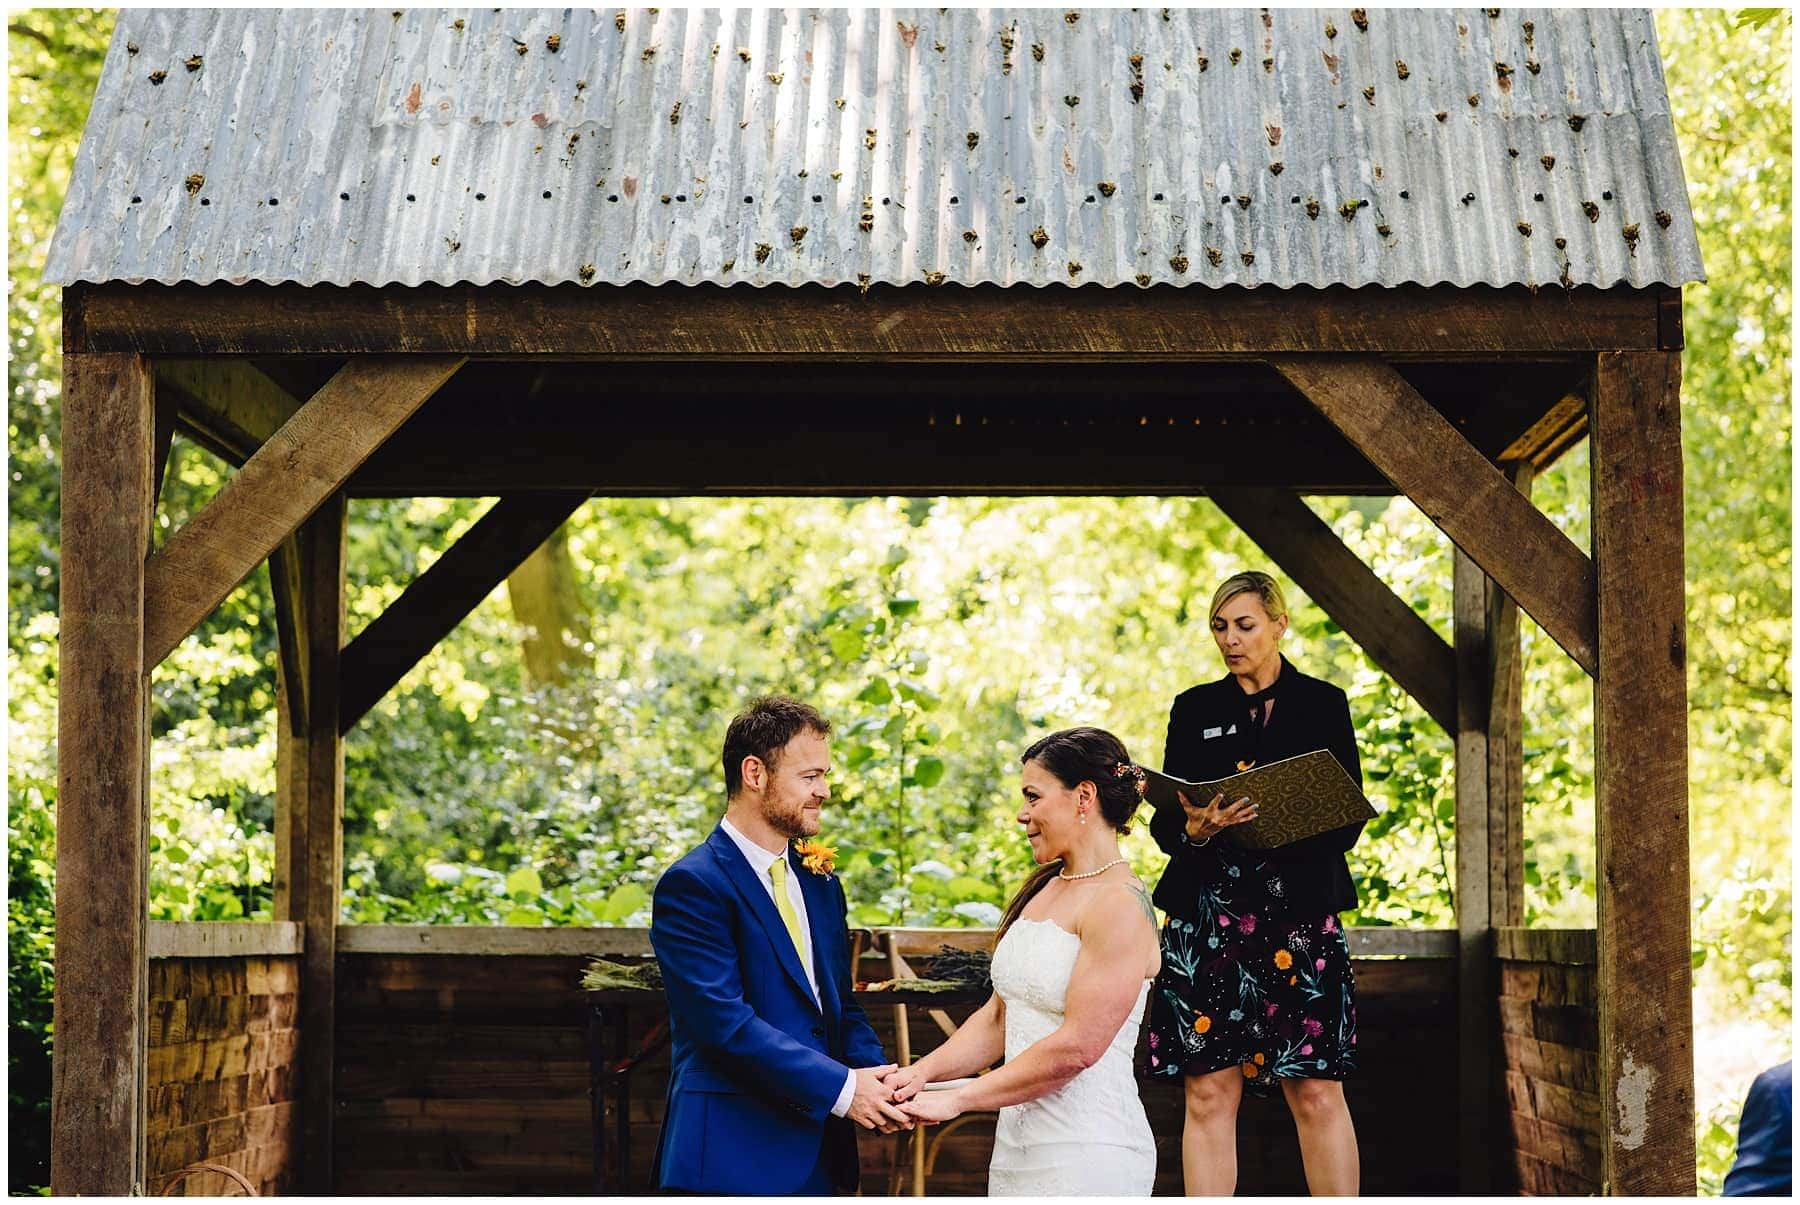 Hothorp Hall Woodlands Wedding Photographer 18